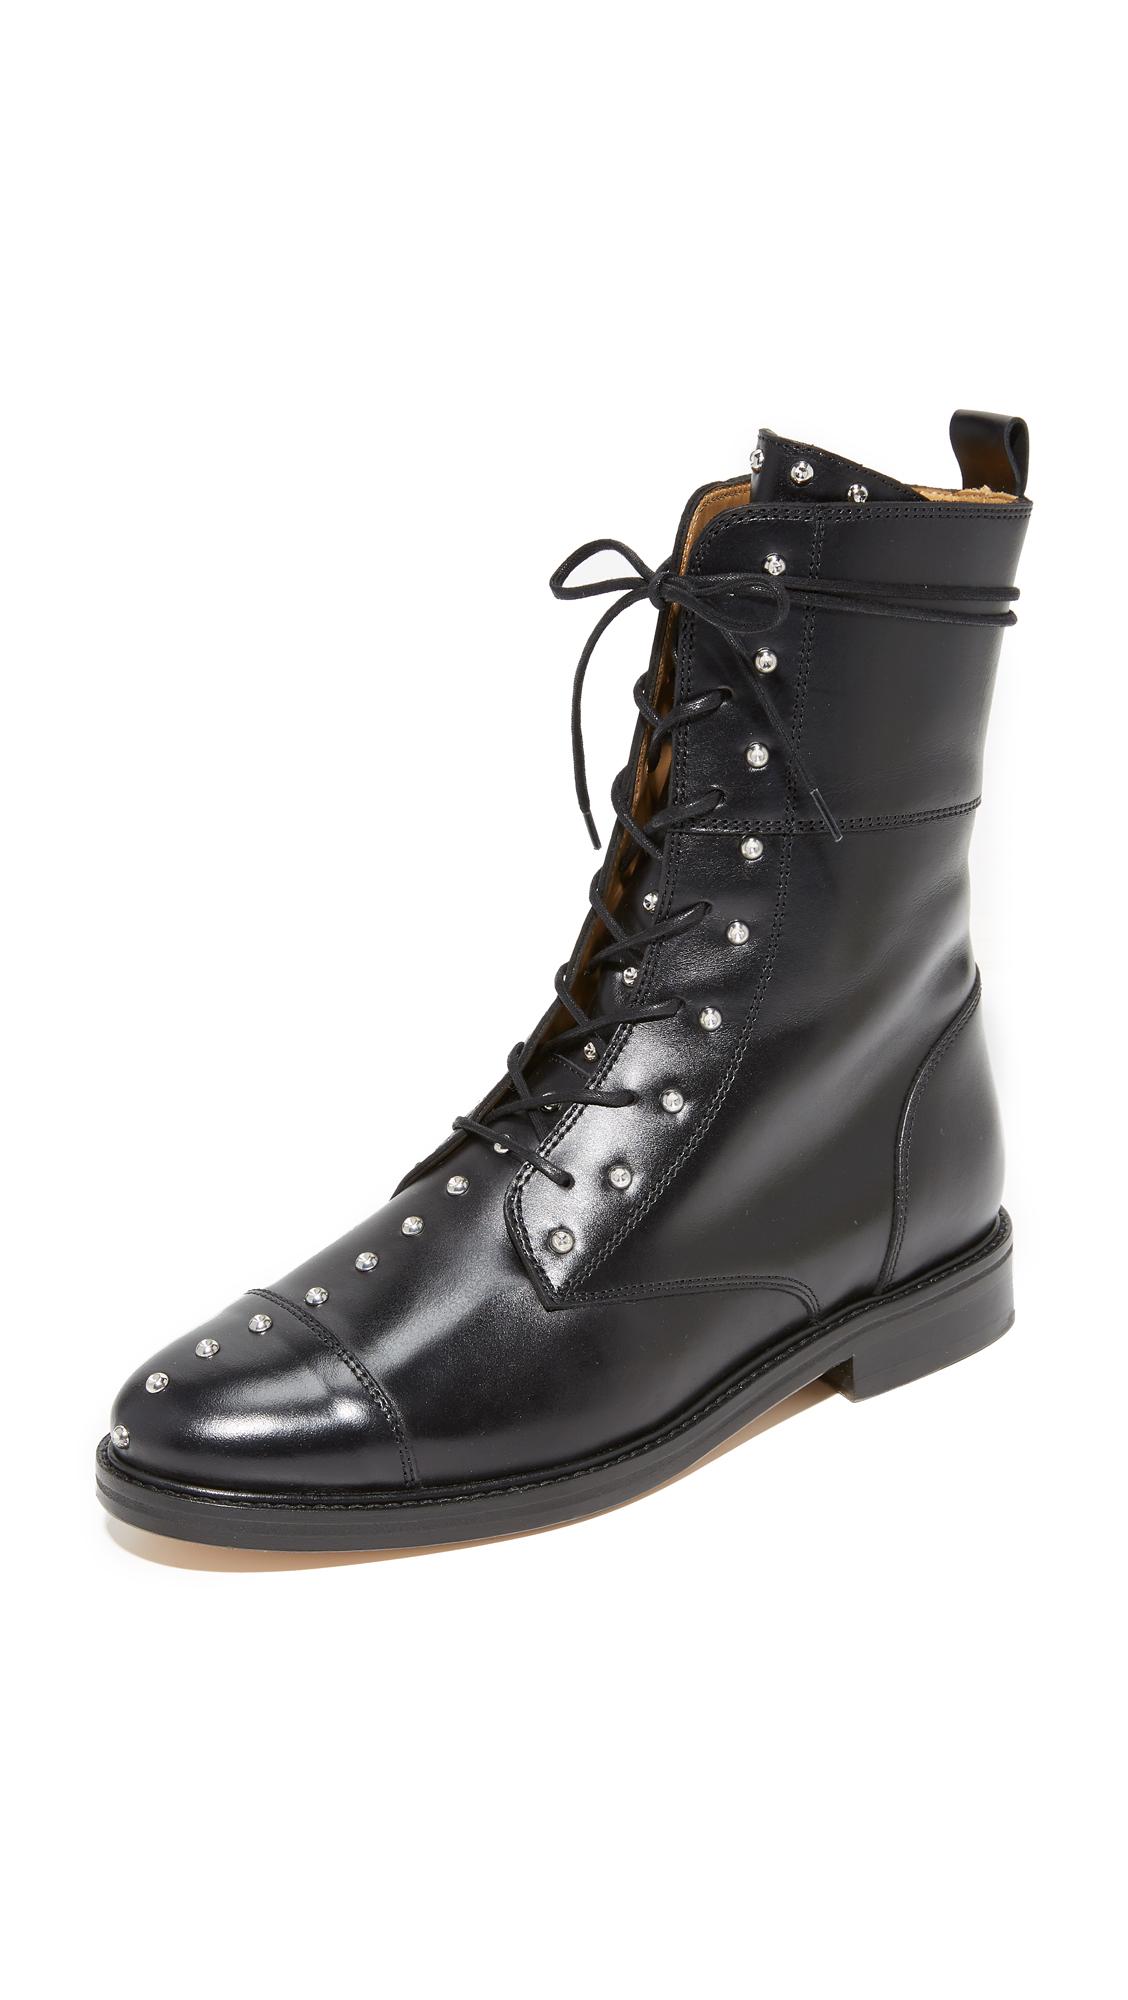 IRO Rangy Military Boots - Black